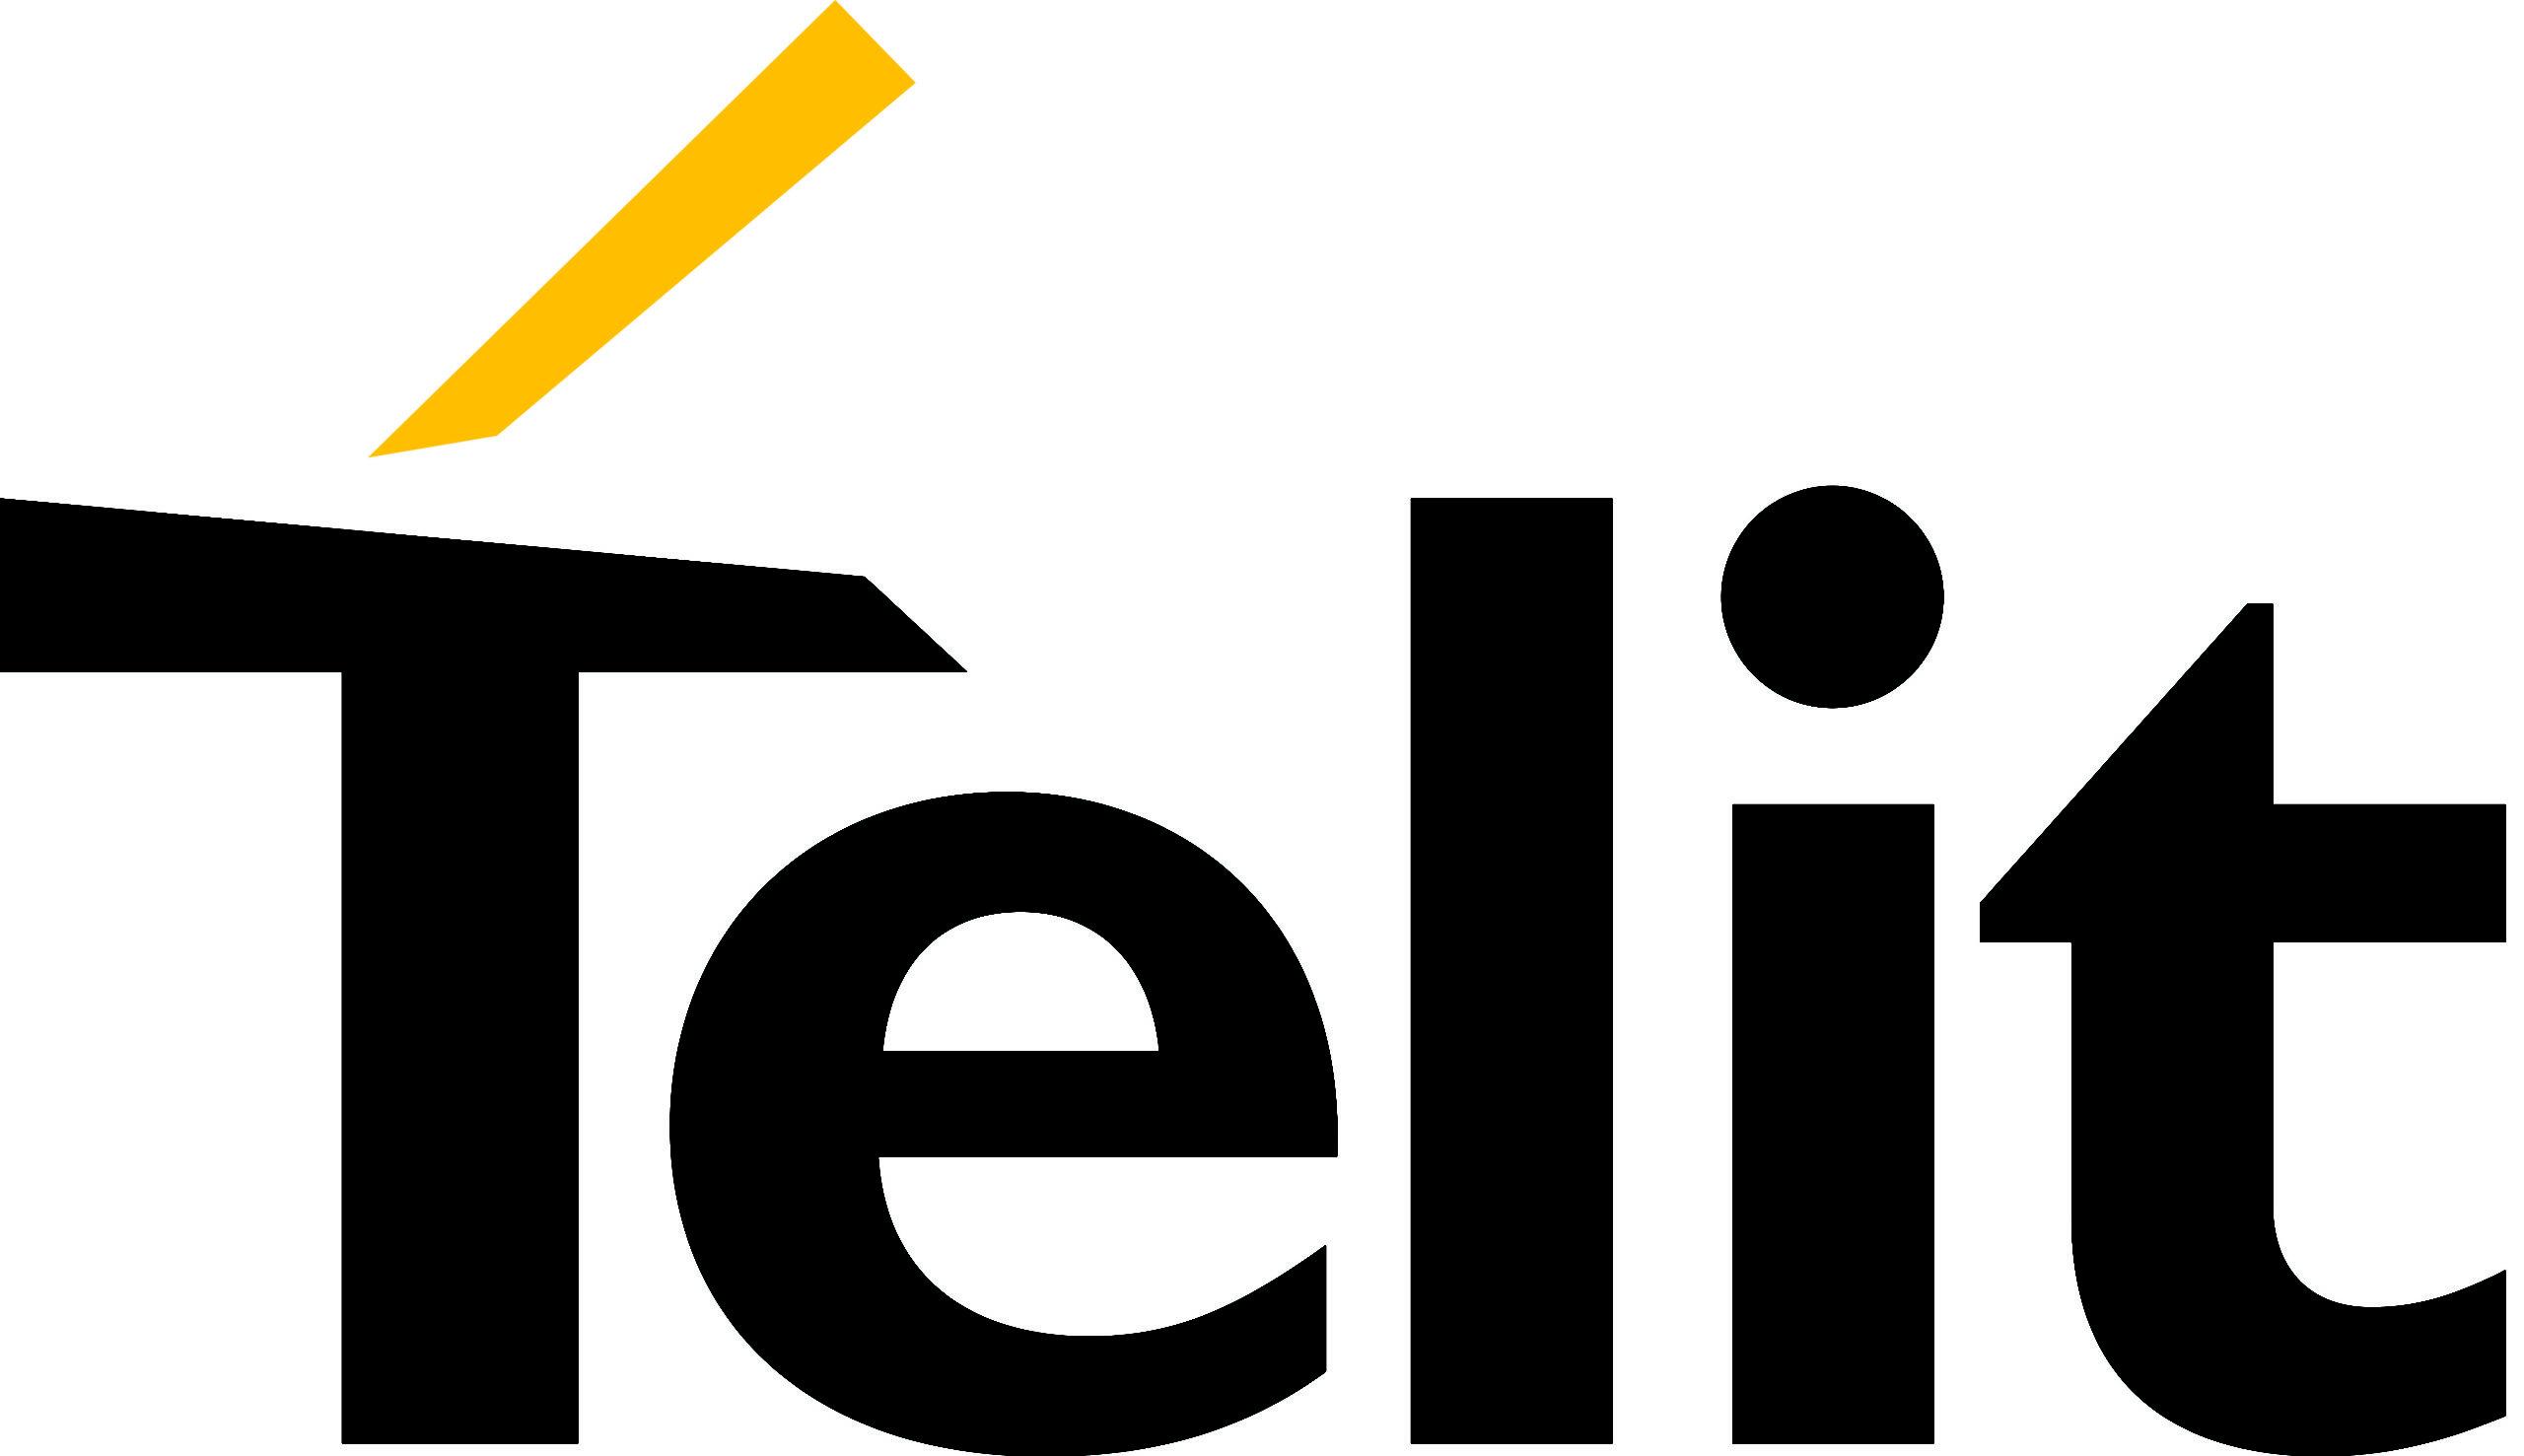 secureWISE, LLC, a Telit Company